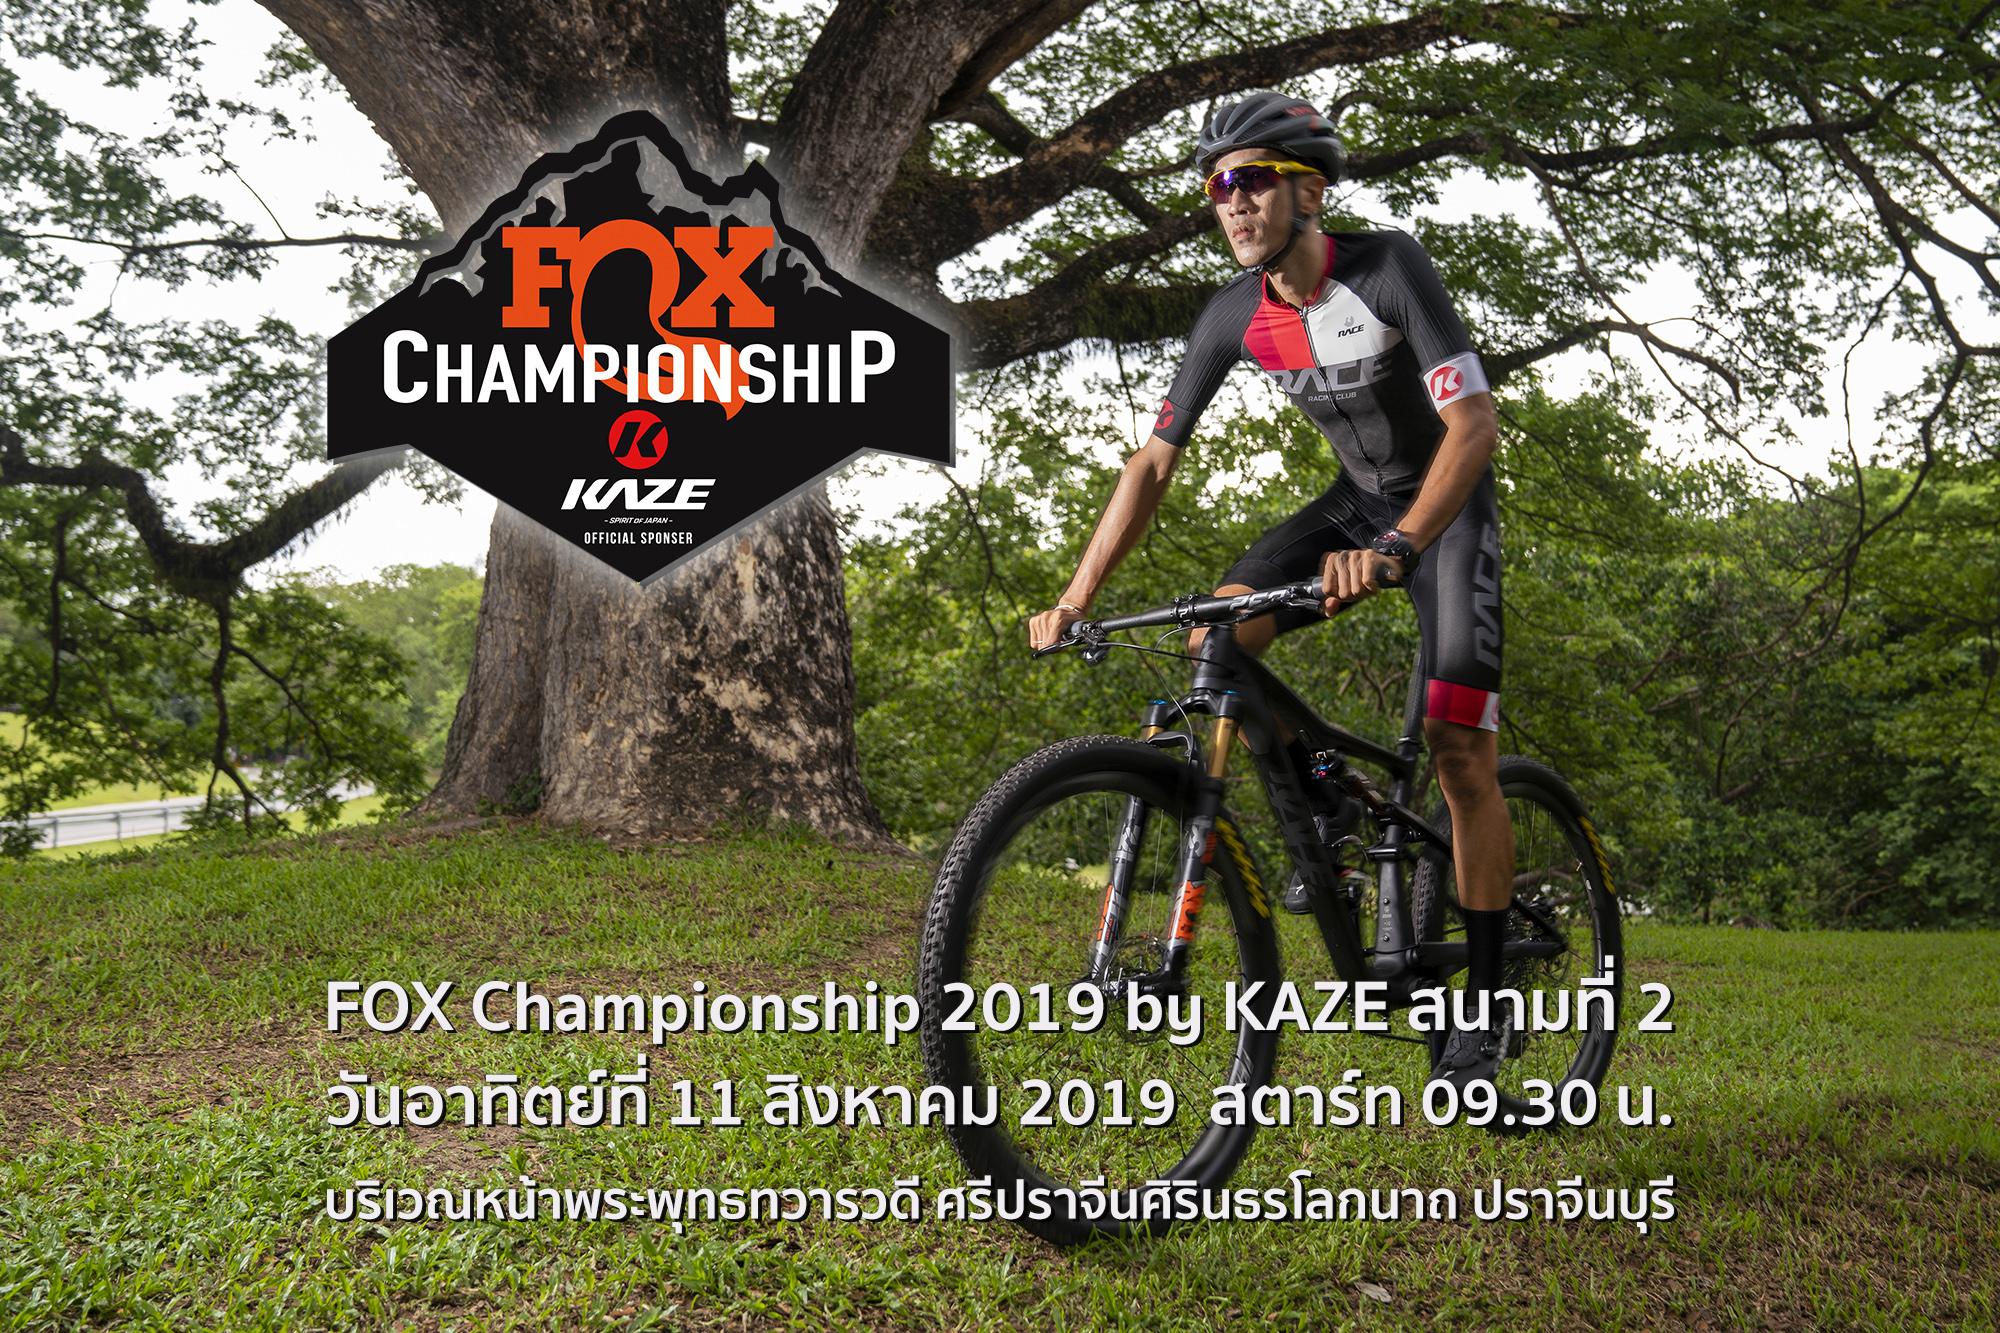 FOX Championship 2019 สนาม #2 by KAZE จ.ปราจีนบุรี